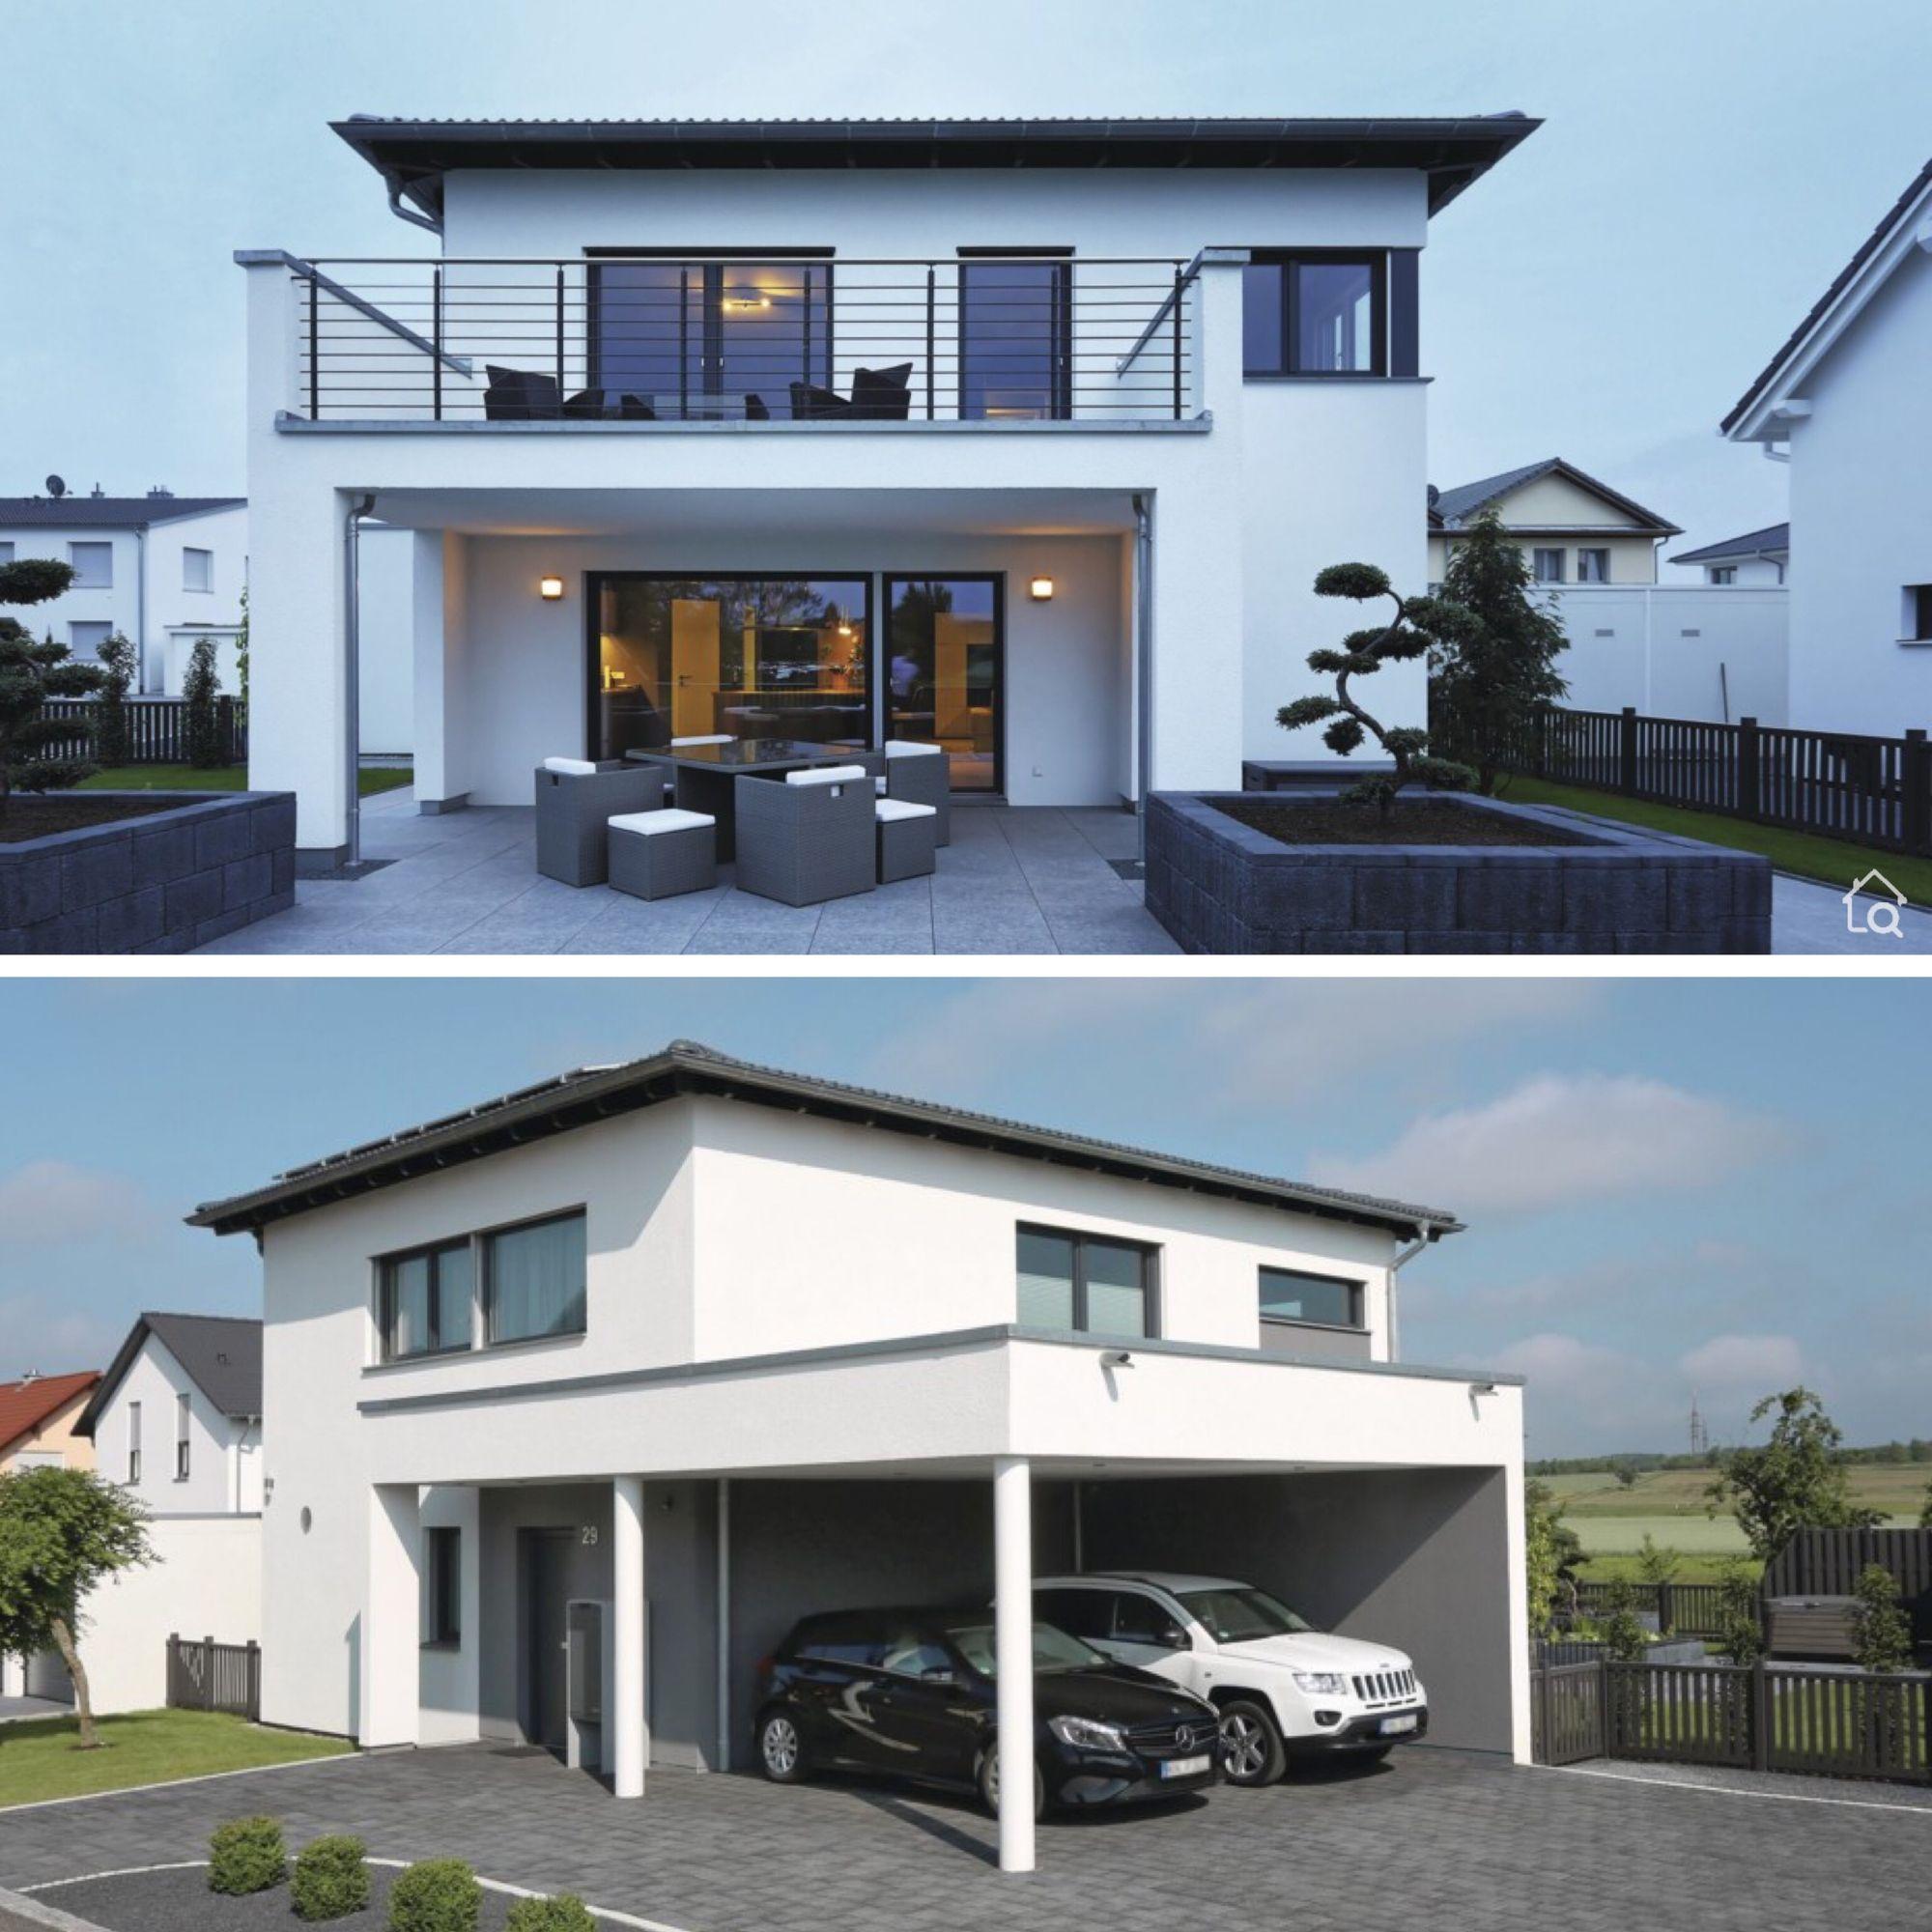 Modern House Architecture Design Ideas With 2 Story Carport Contemporary European Styles In 2020 Haus Grundriss Walmdach Haus Architektur